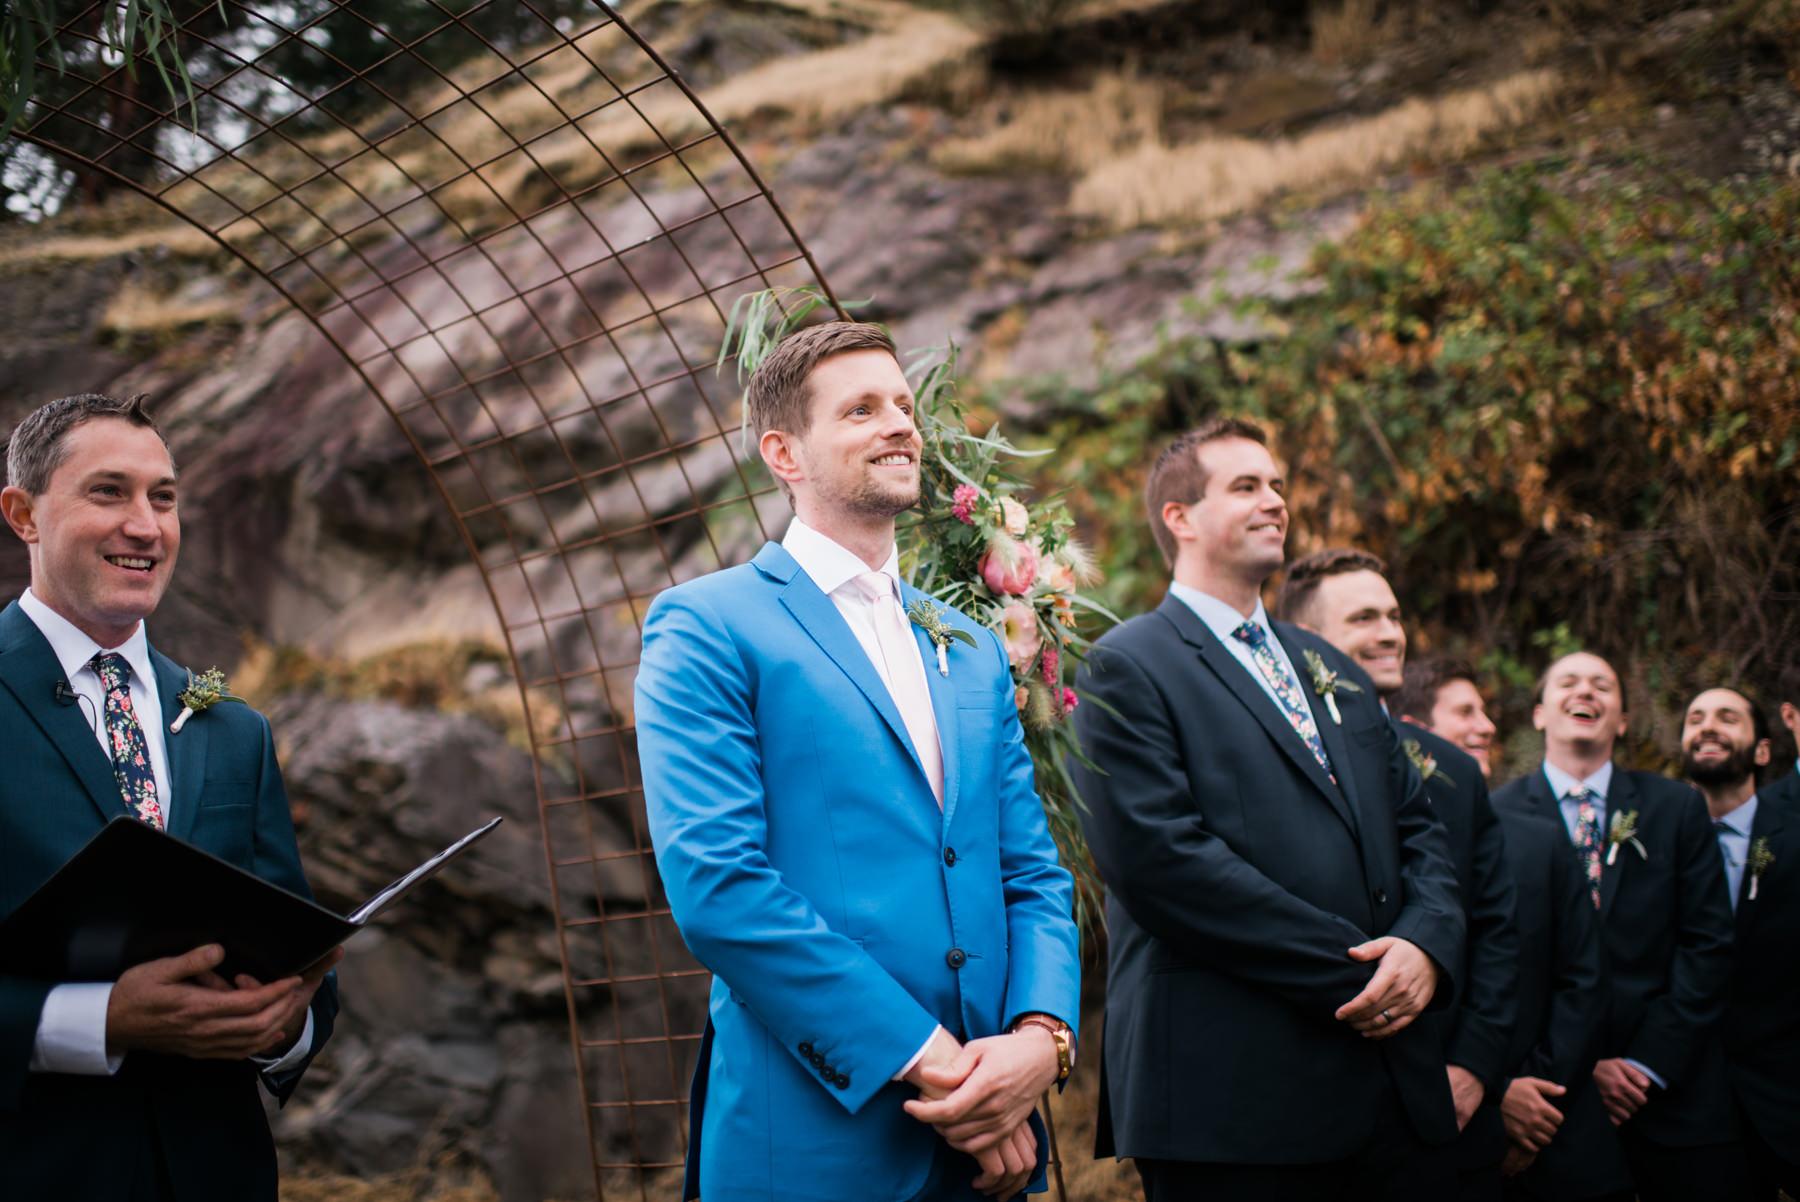 315-colorful-outdoor-lopez-island-wedding.jpg